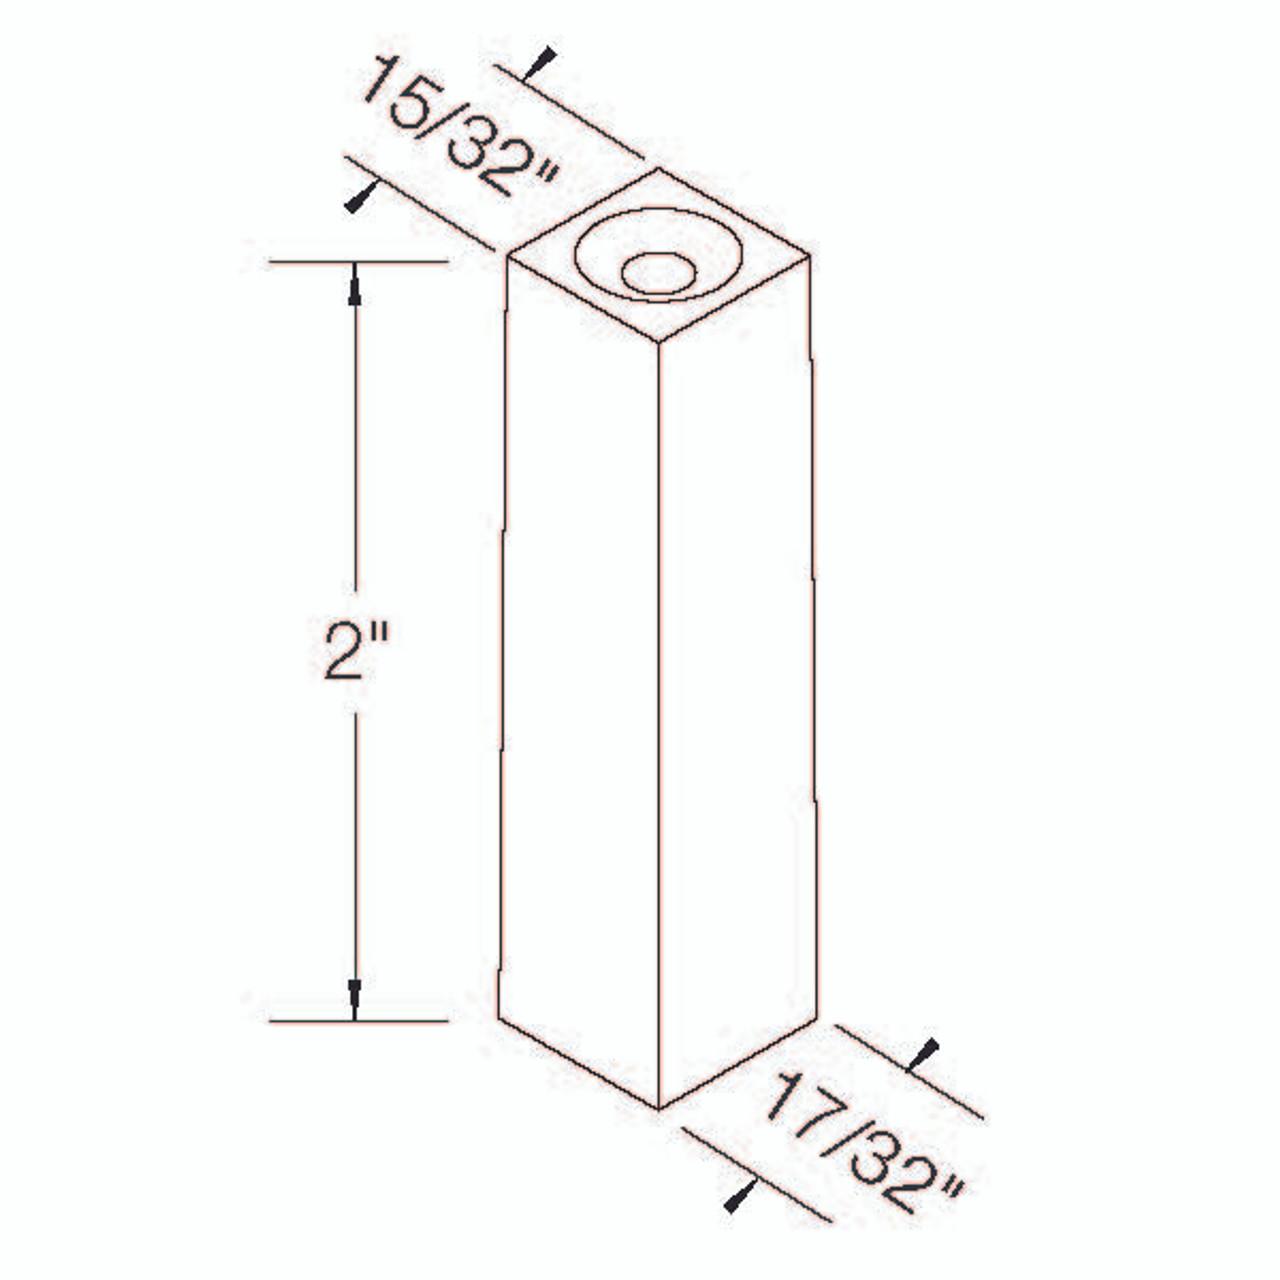 2GPlug Dimensional Information